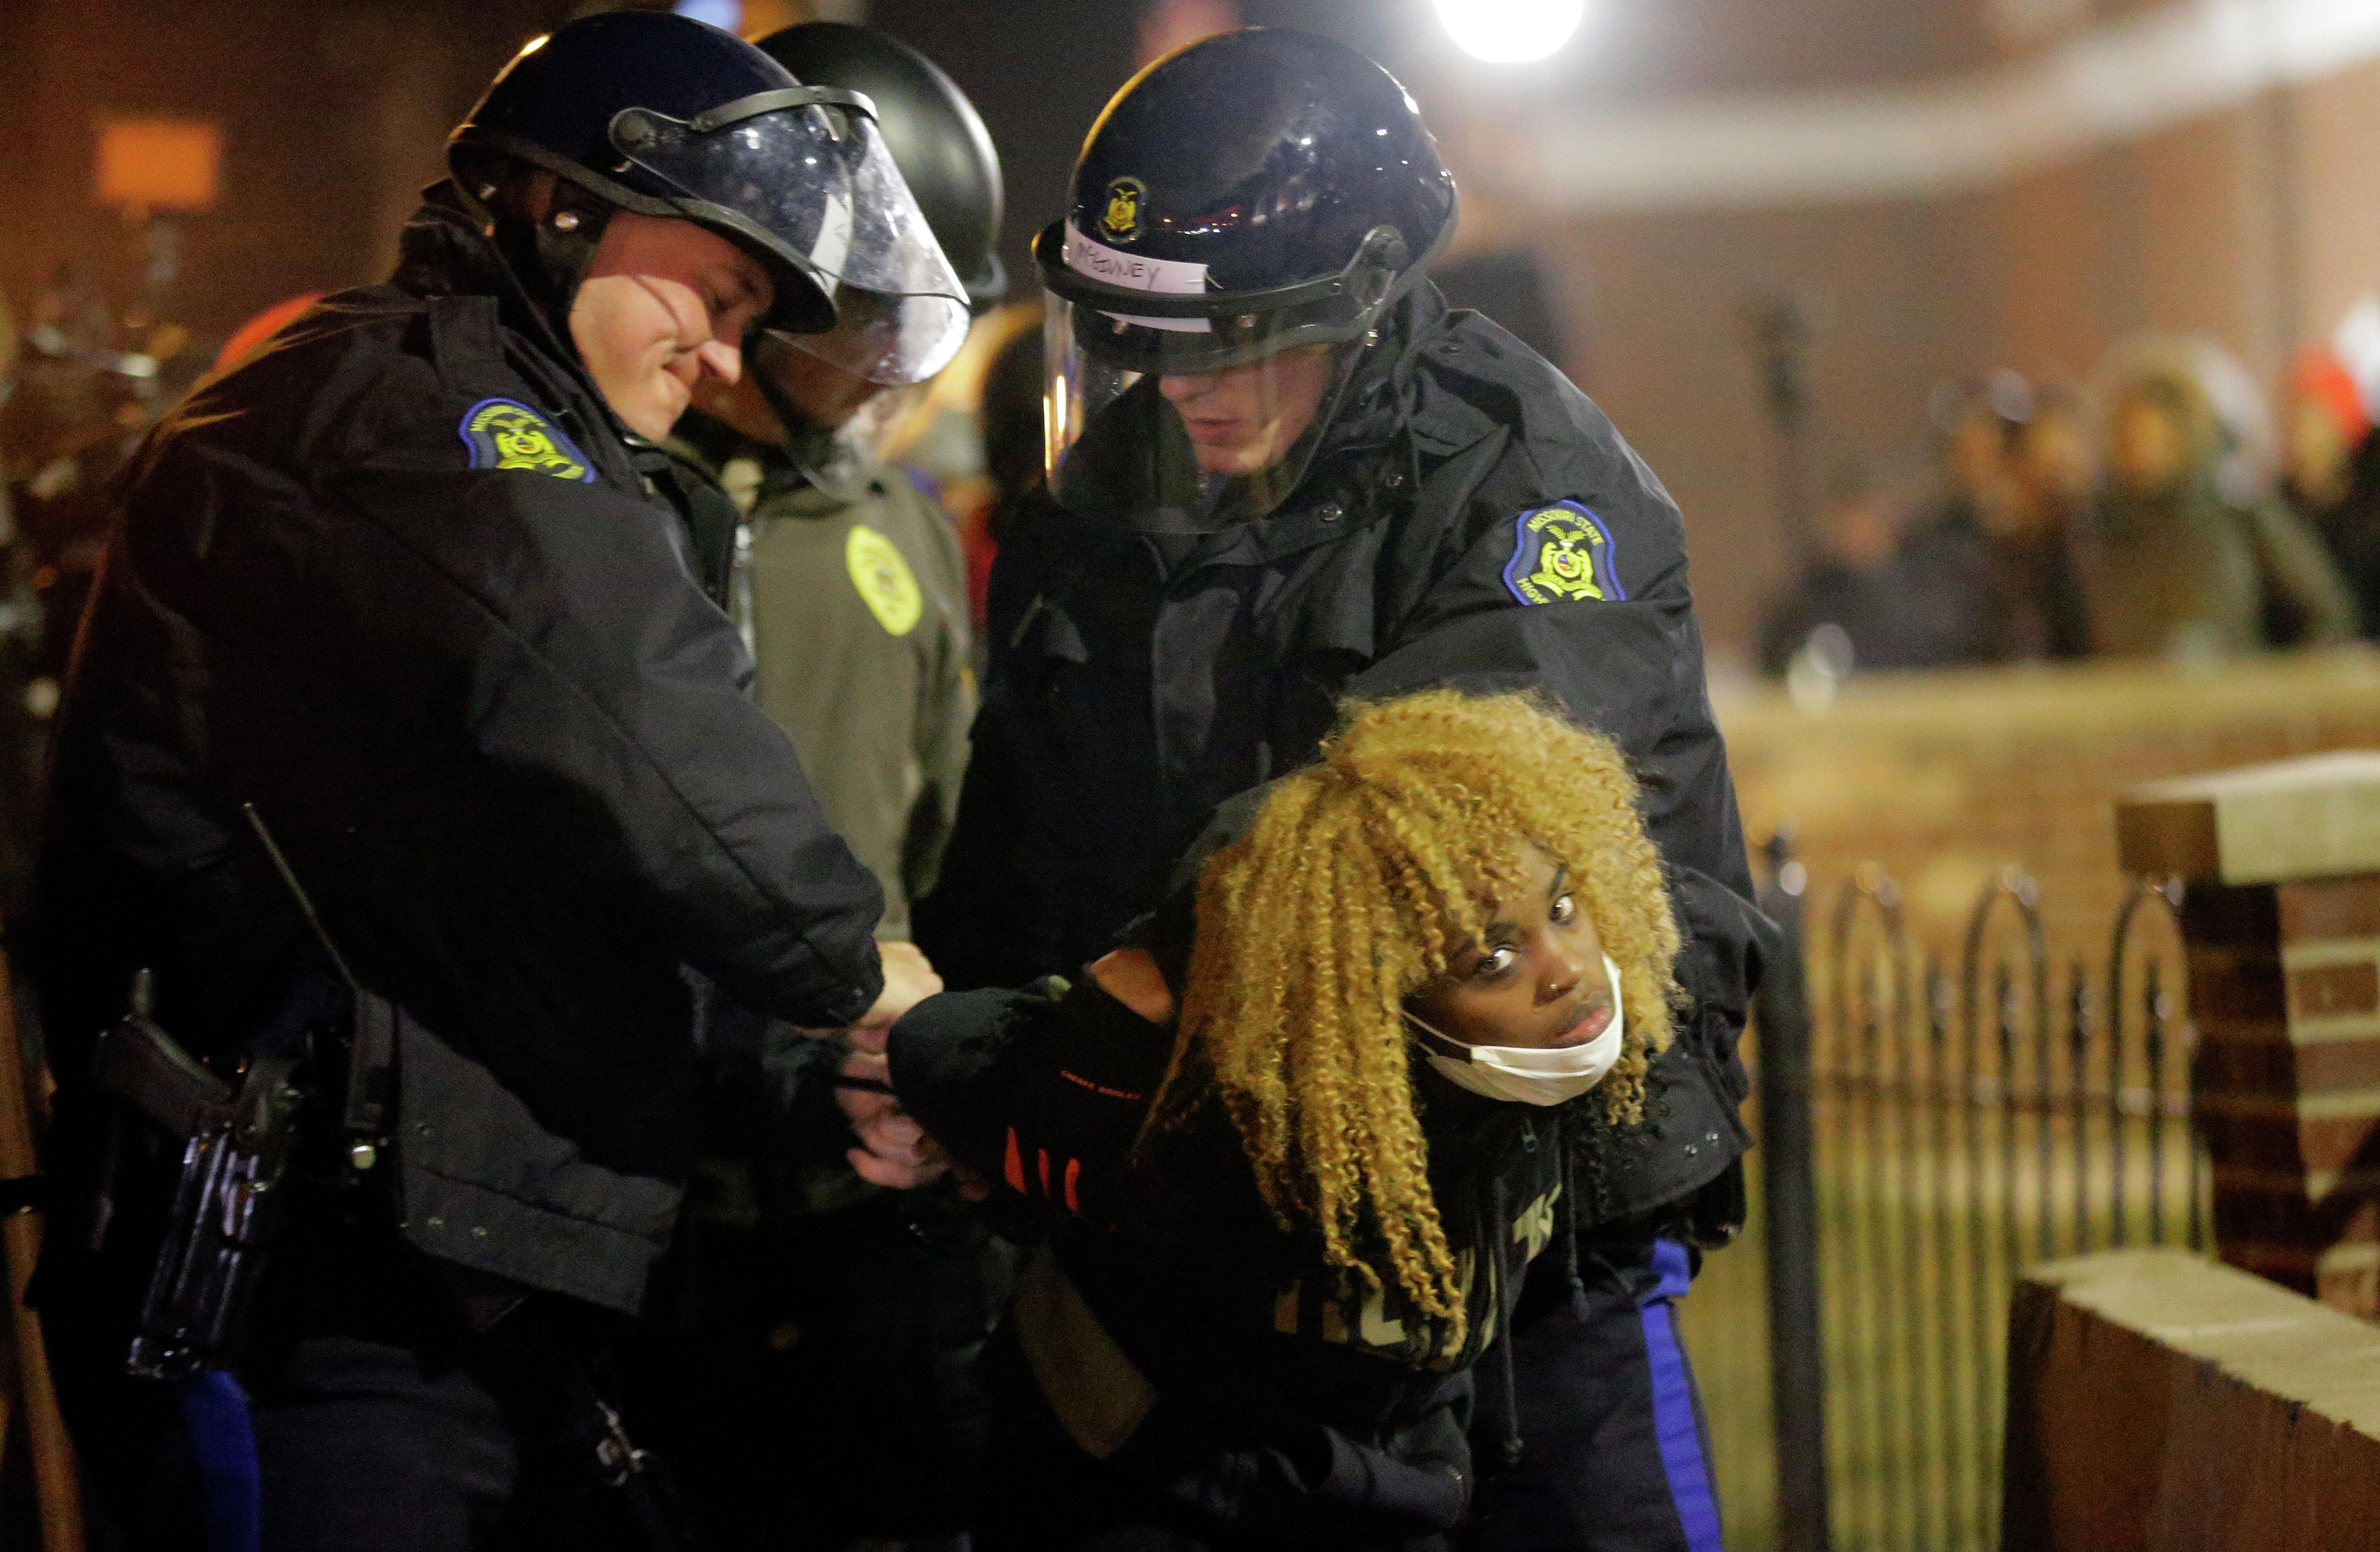 Police officers take a protester into custody Tuesday, Nov. 25, 2014, in Ferguson, Mo.